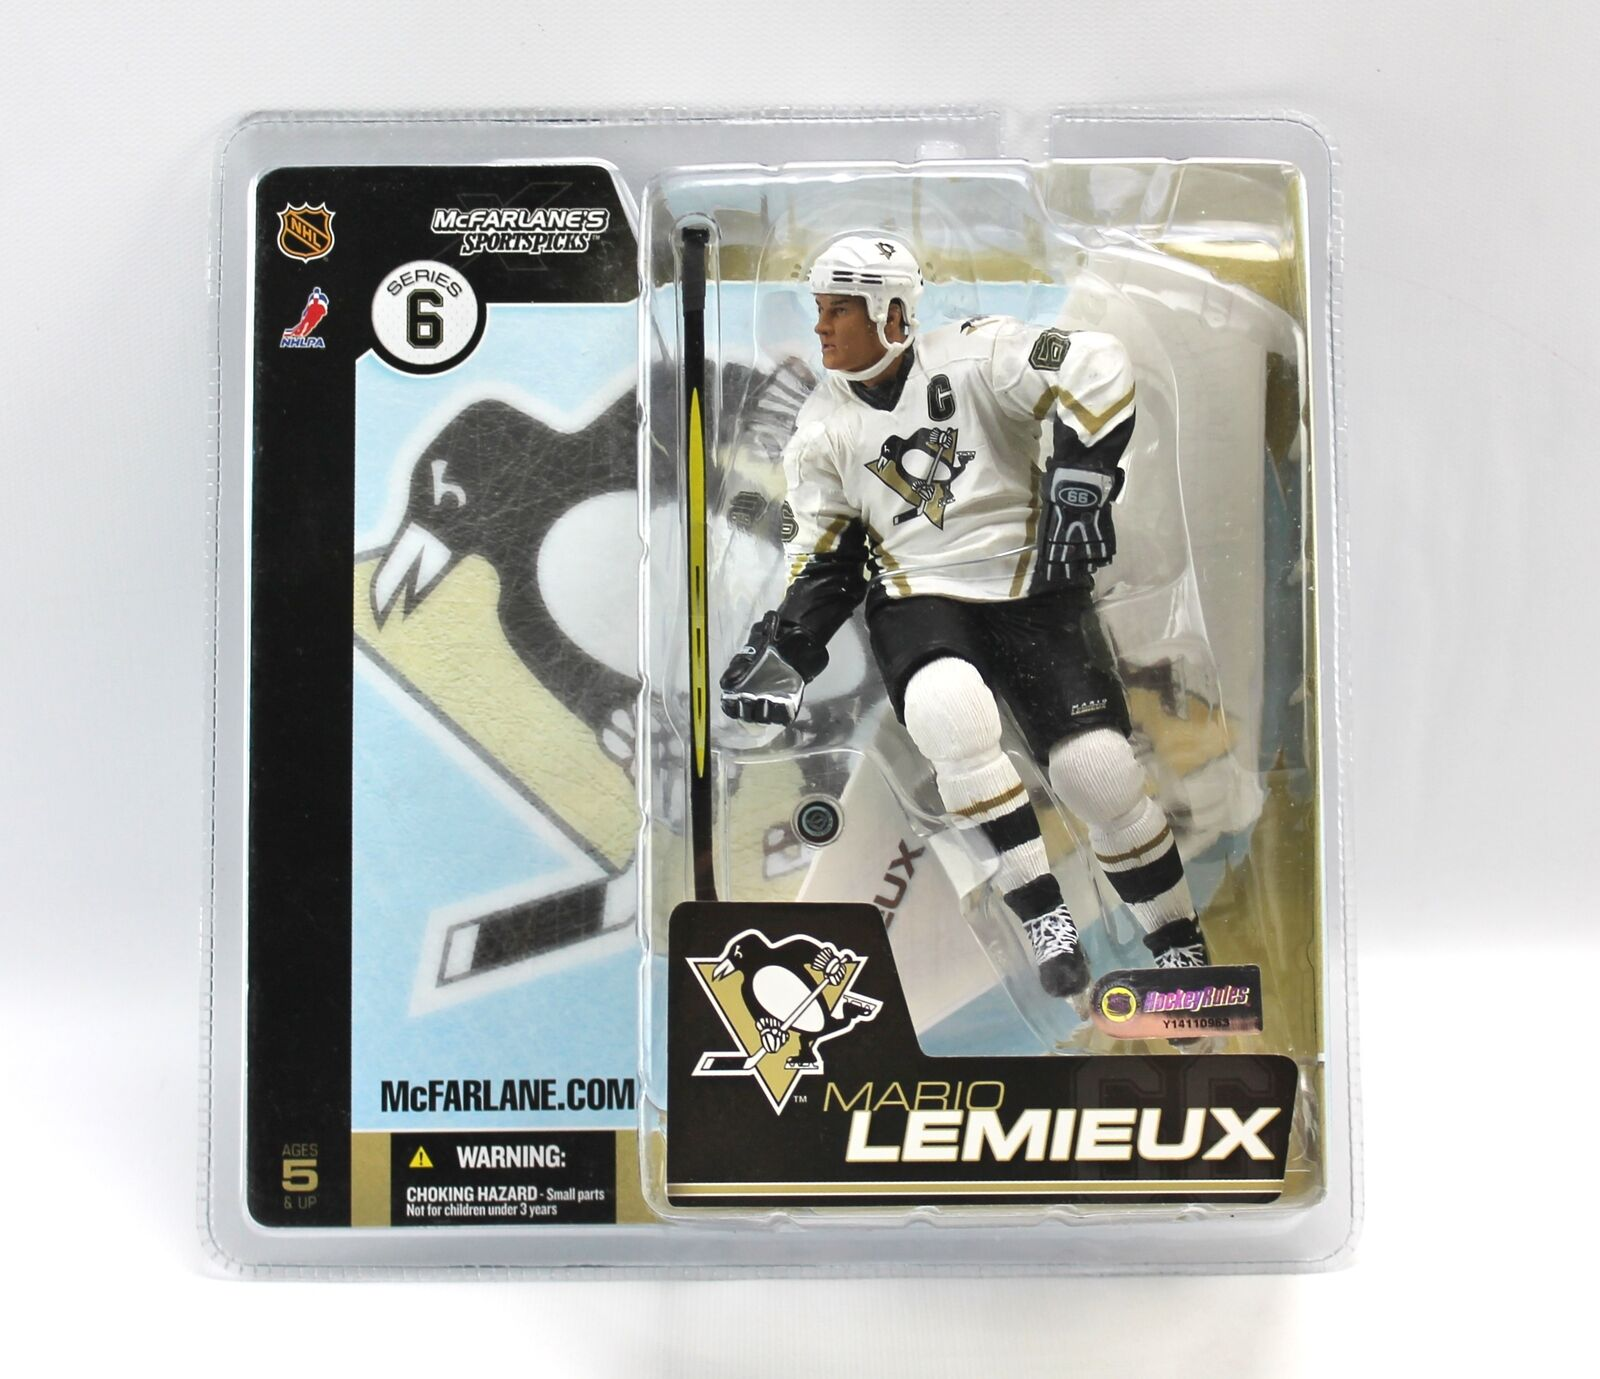 McFarlane MARIO LEMIEUX Pittsburgh Penguins NHL cifra Series 6 2003